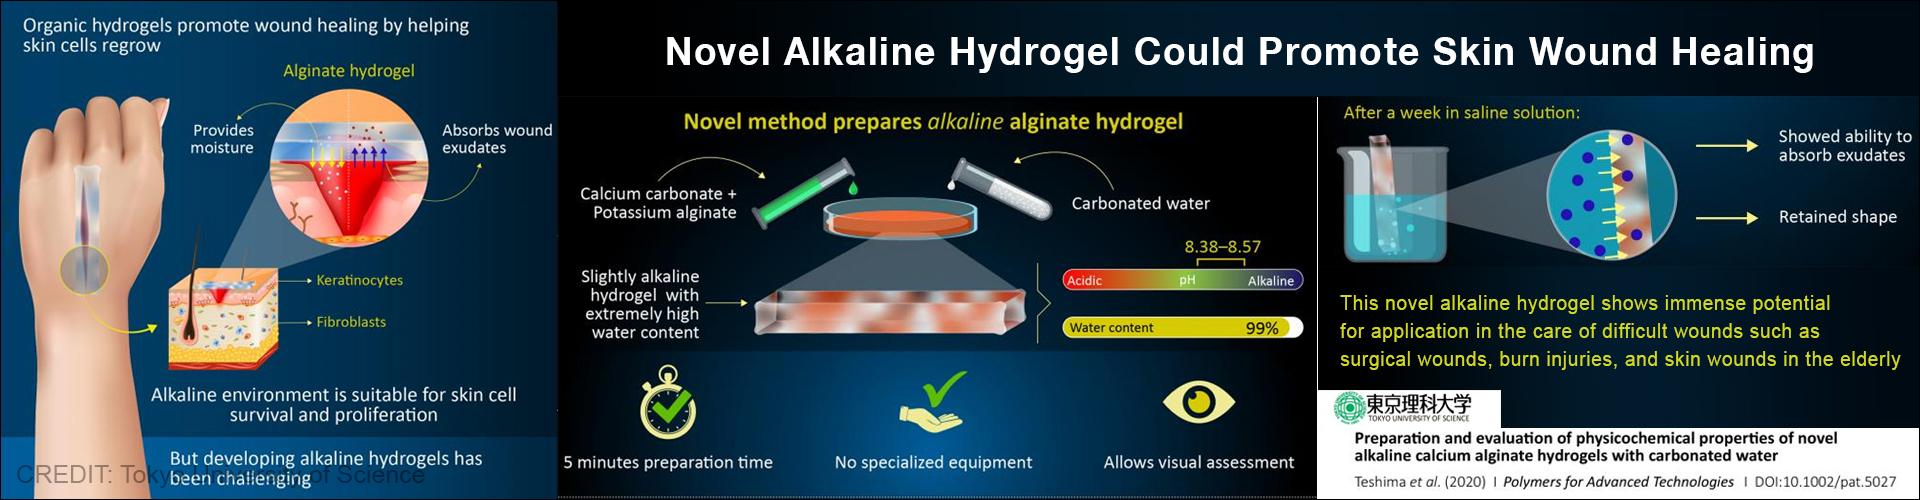 Natural Alkaline Hydrogel Helps Promote Wound Healing